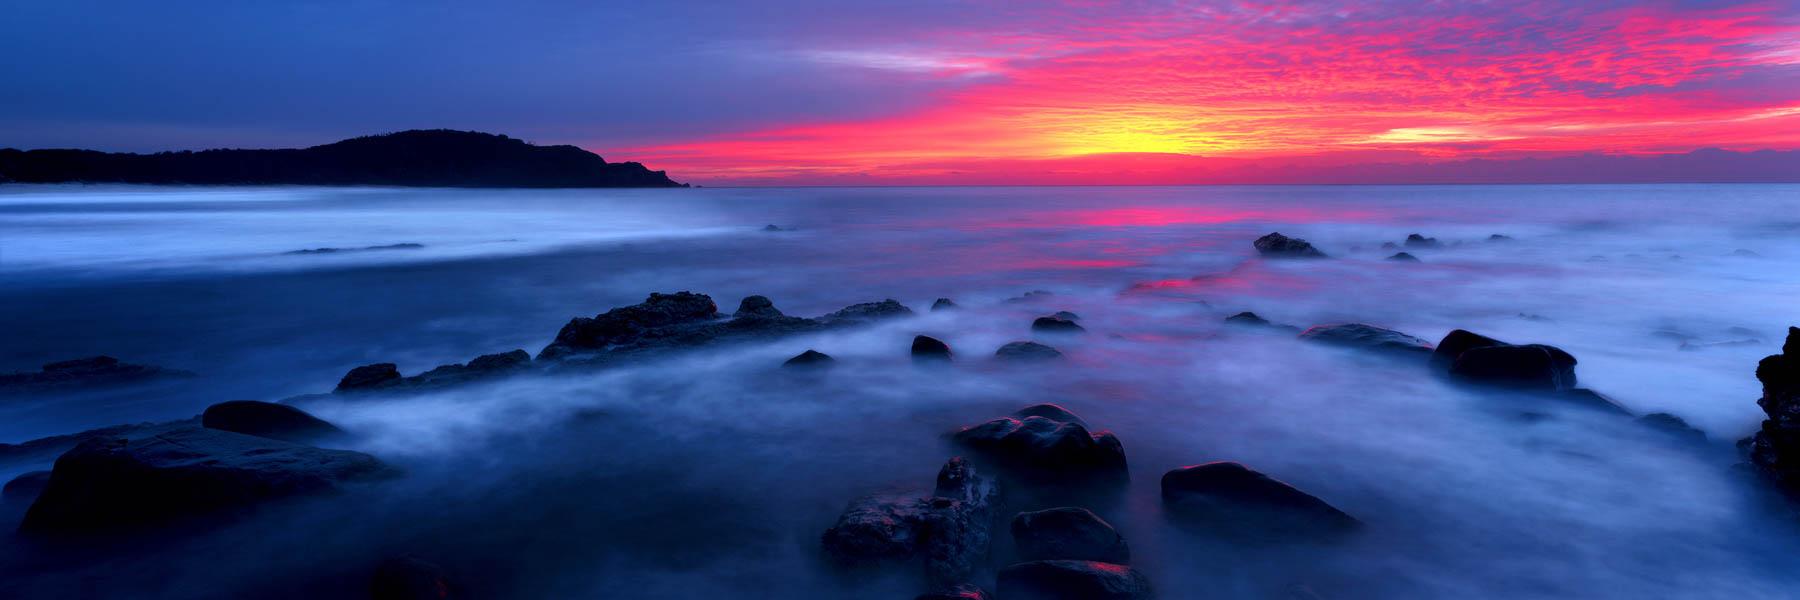 A vivid sunrise over Boomerang Beach, Pacific Palms, NSW, Australia.